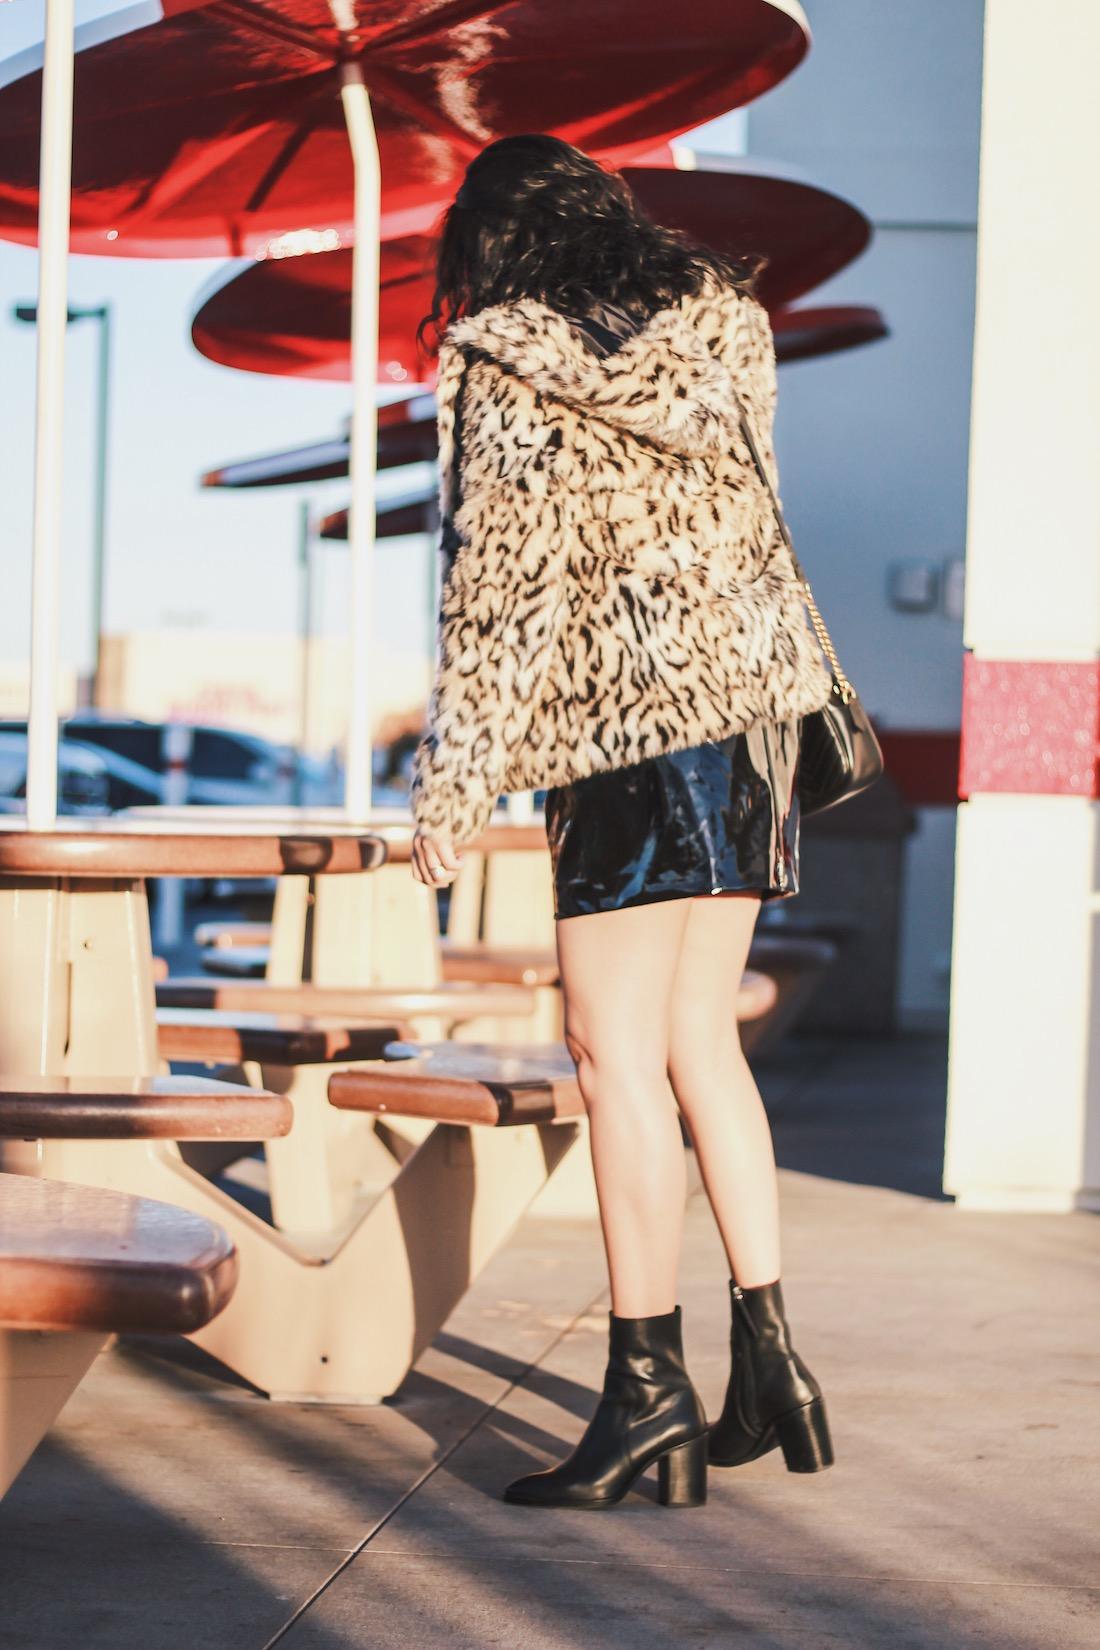 Leopard-Print-Jacket-Patent-Skirt-Ankle-Boots-Allaboutgoodvibes.com_Molly Larsen